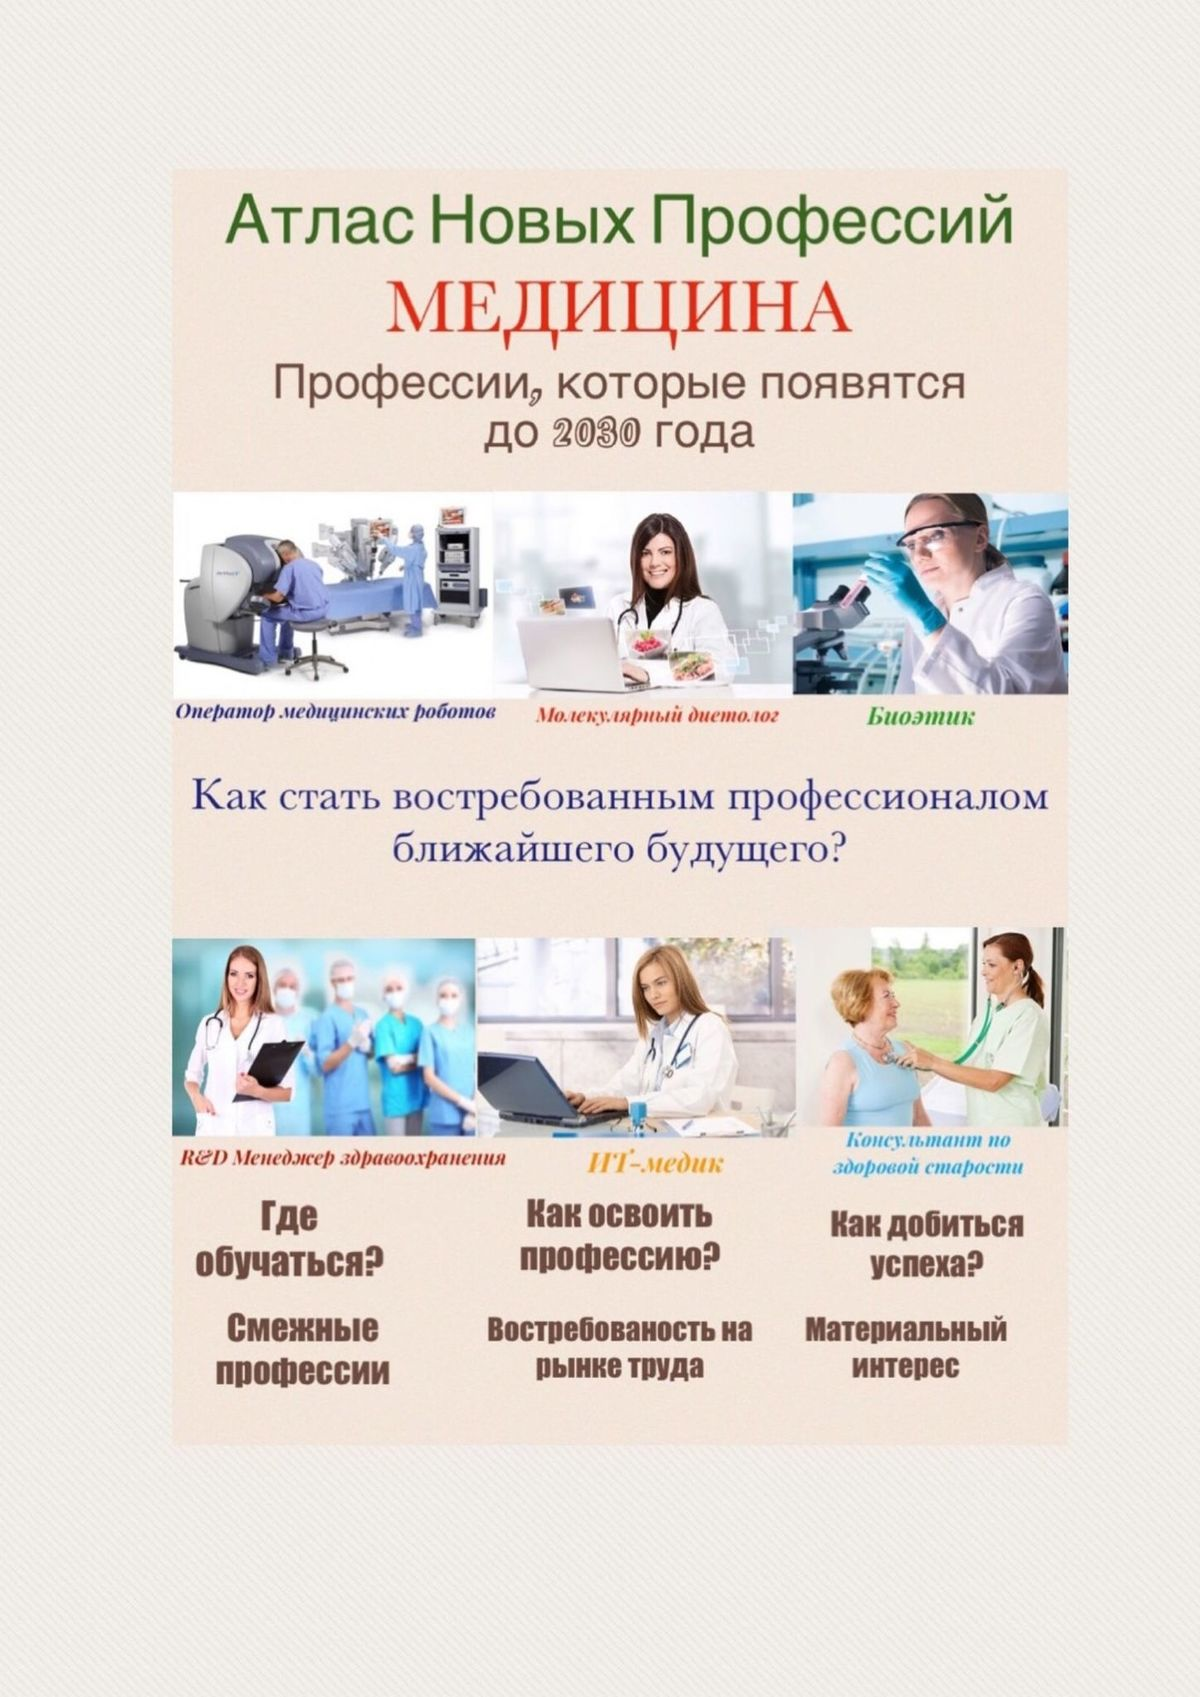 Татьяна Александровна Тонунц Атлас Новых Профессий. МЕДИЦИНА